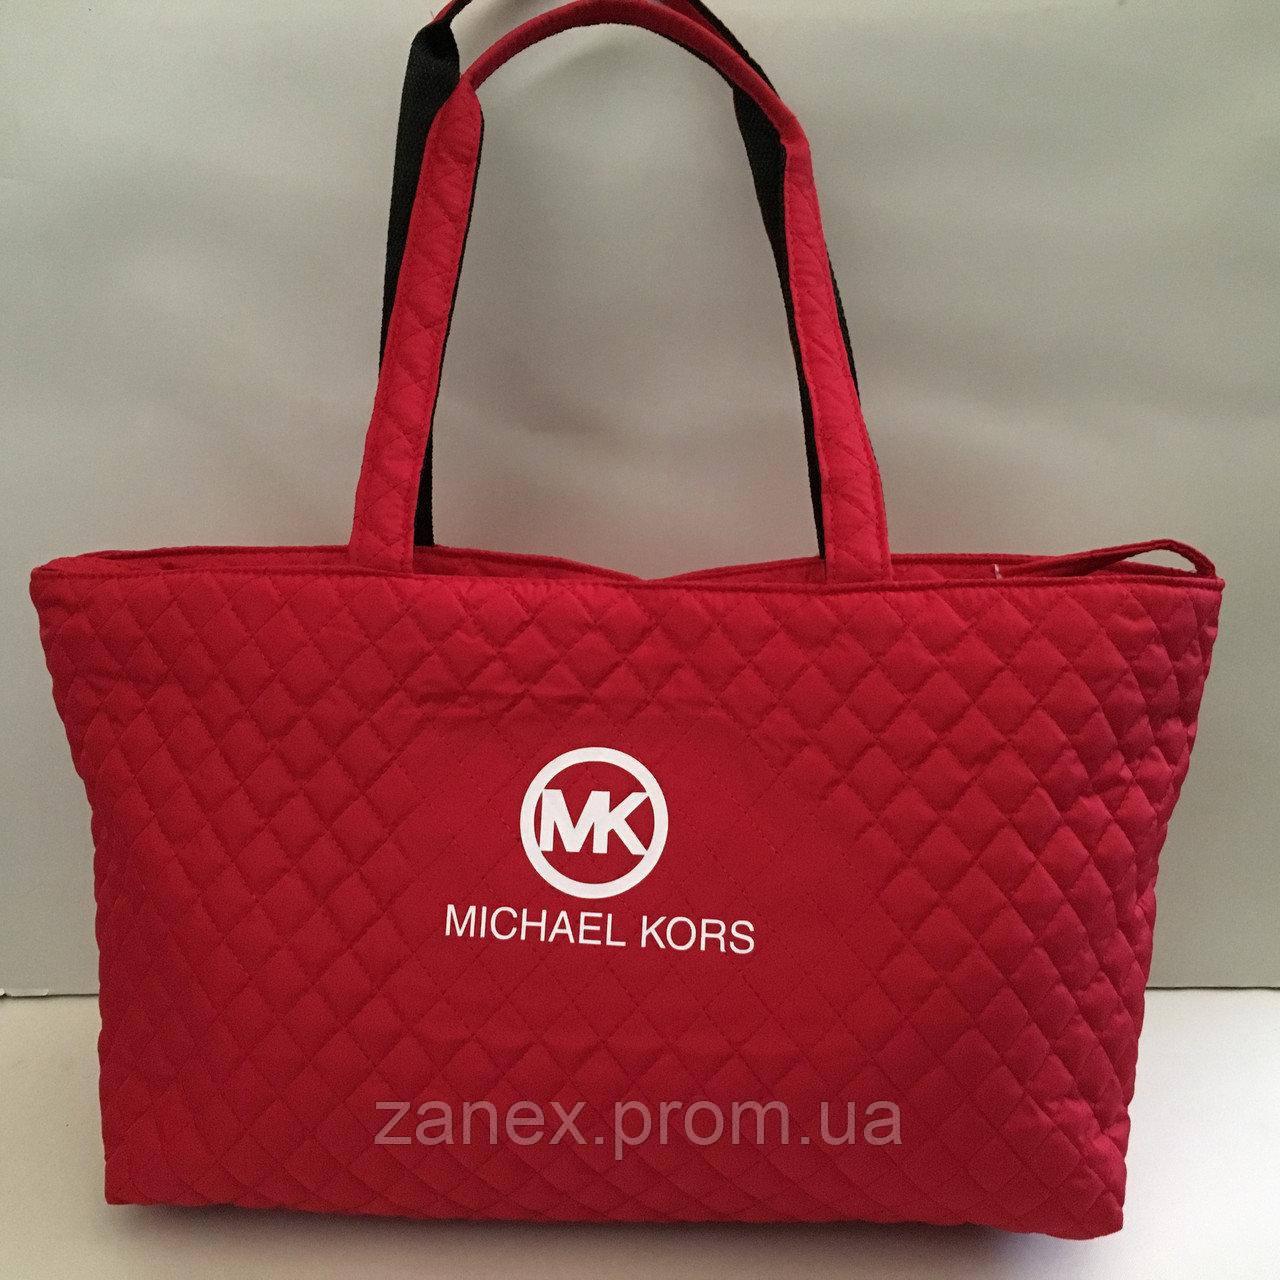 Женская сумка стеганая (красная) Michael Kors